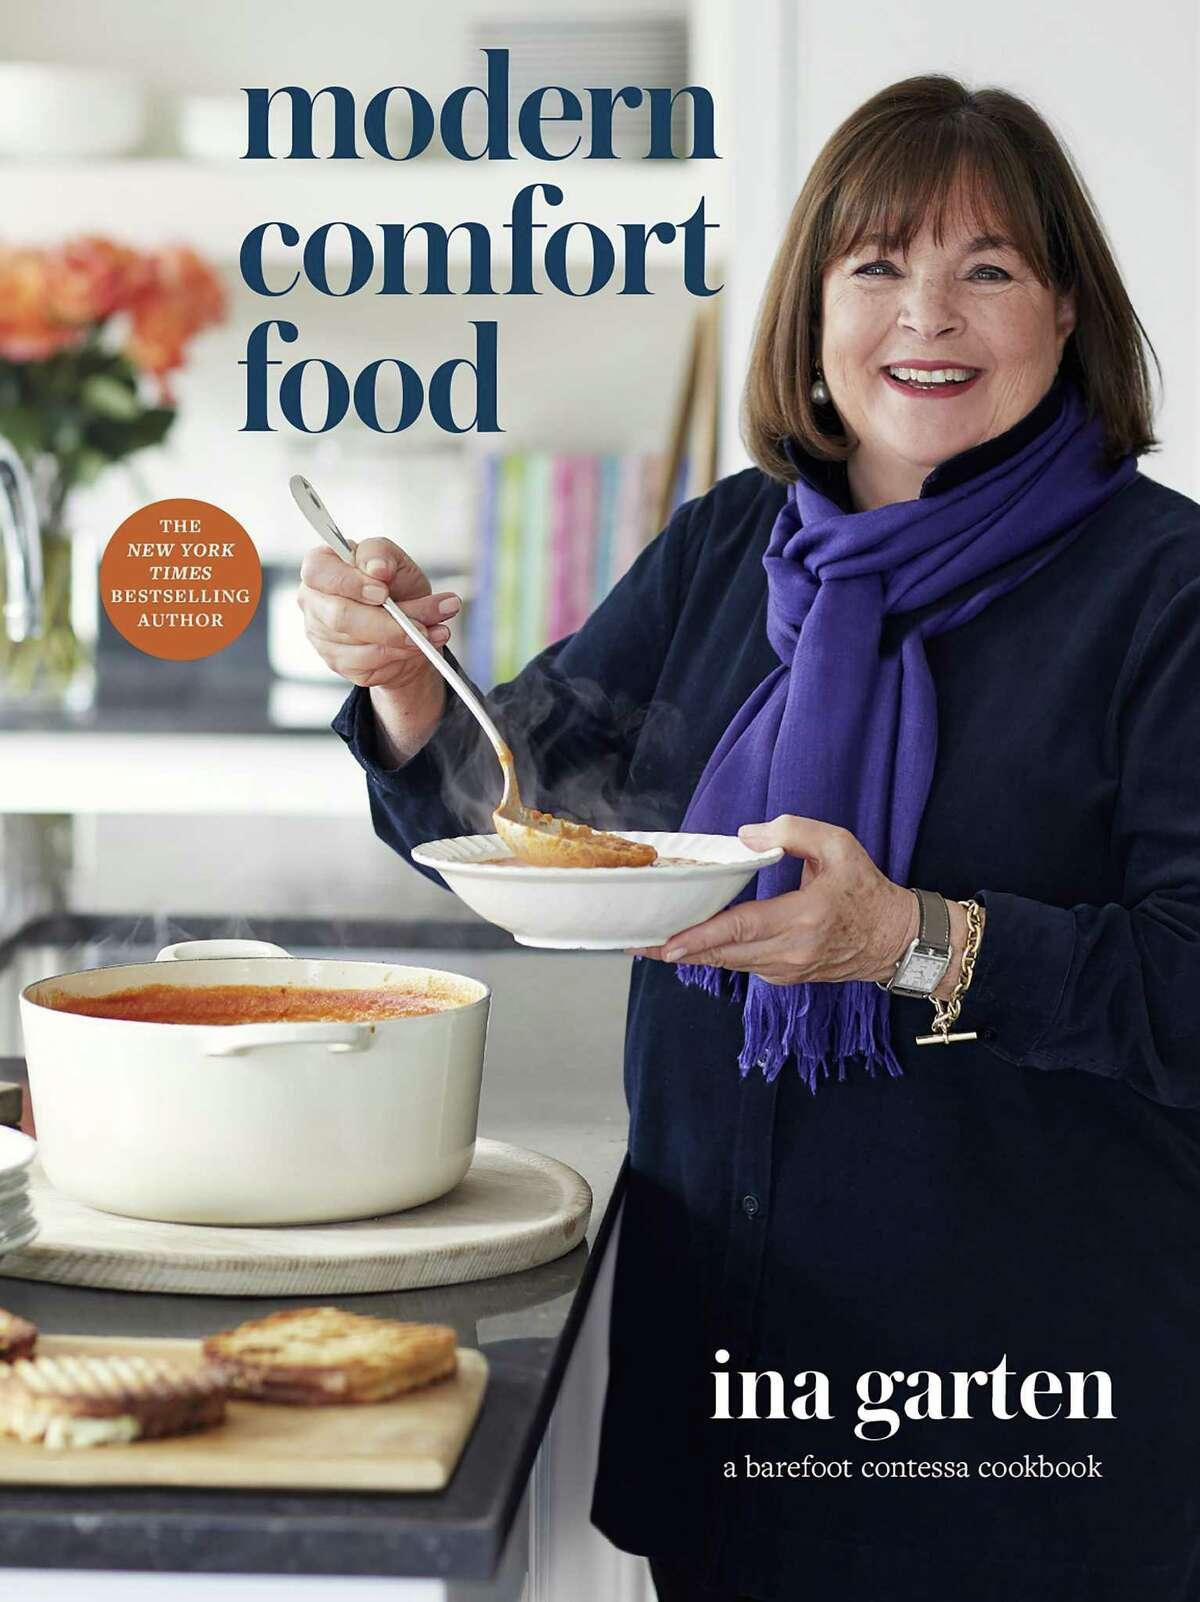 Ina Garten's latest cookbook